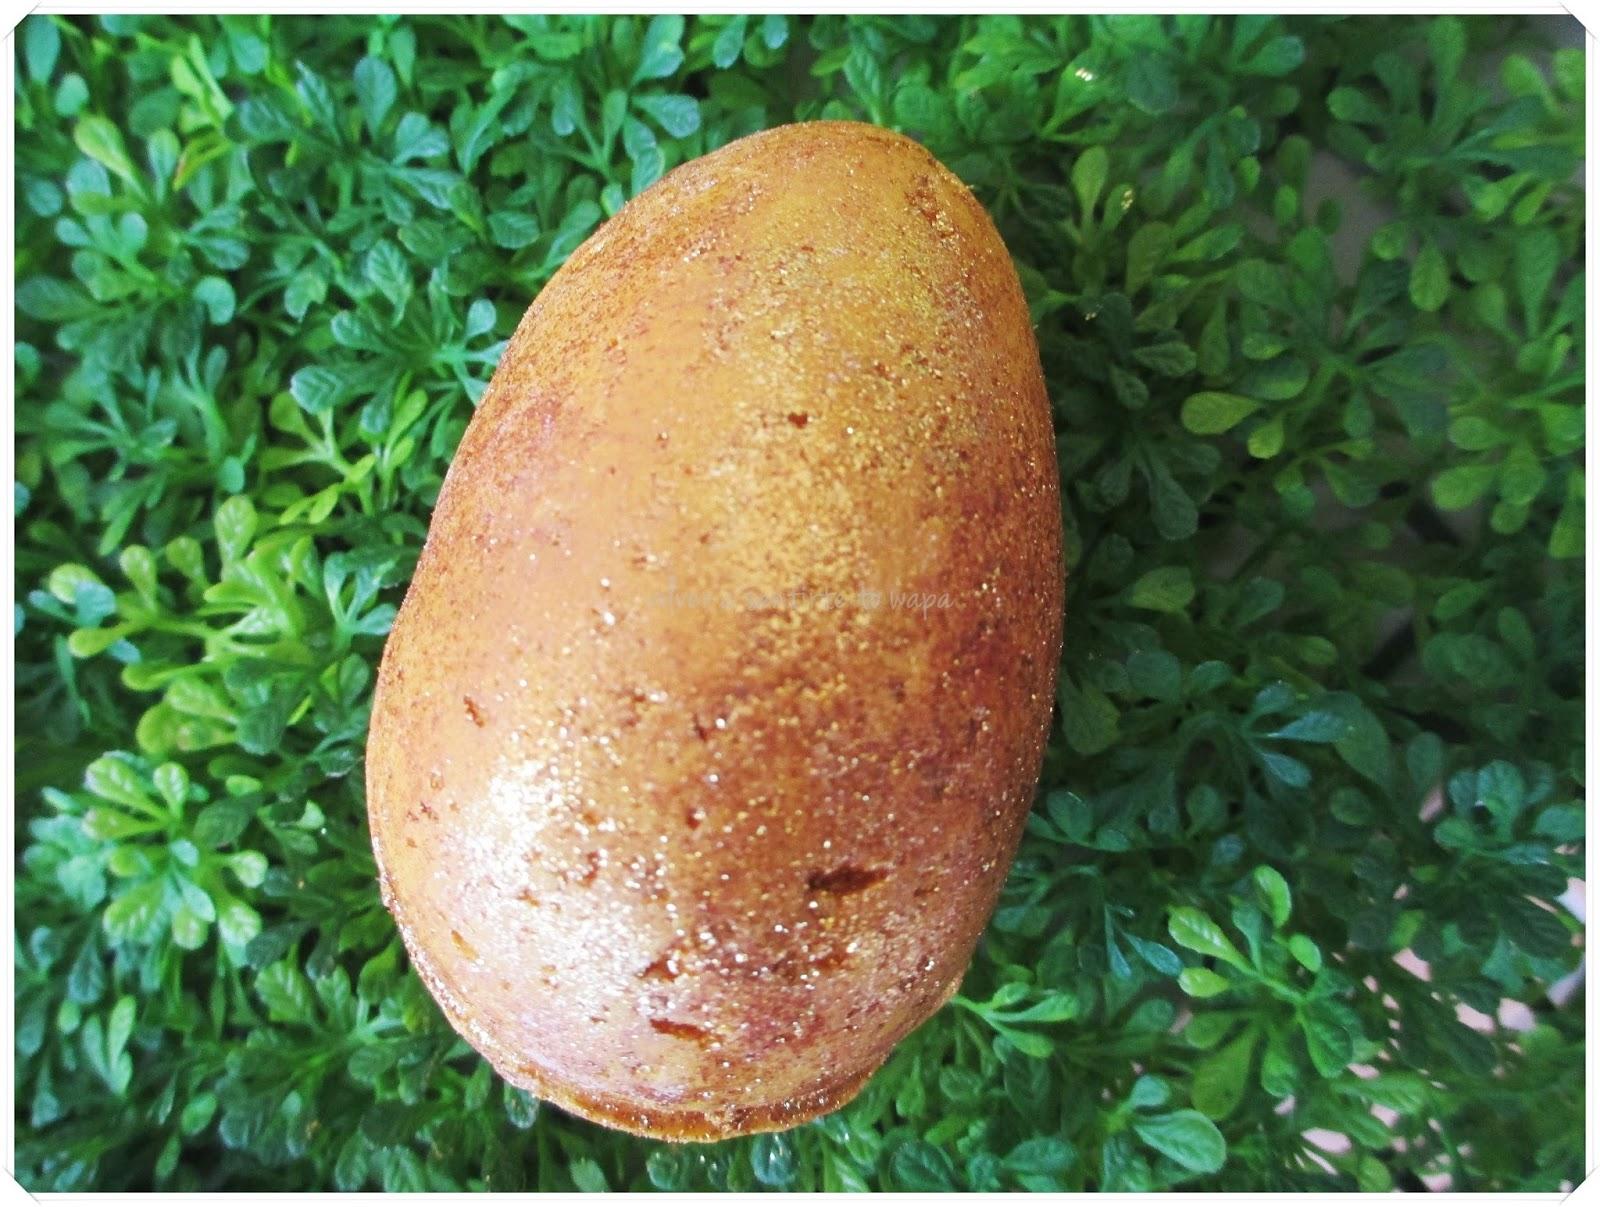 Lush - Bomba de Baño Golden Egg